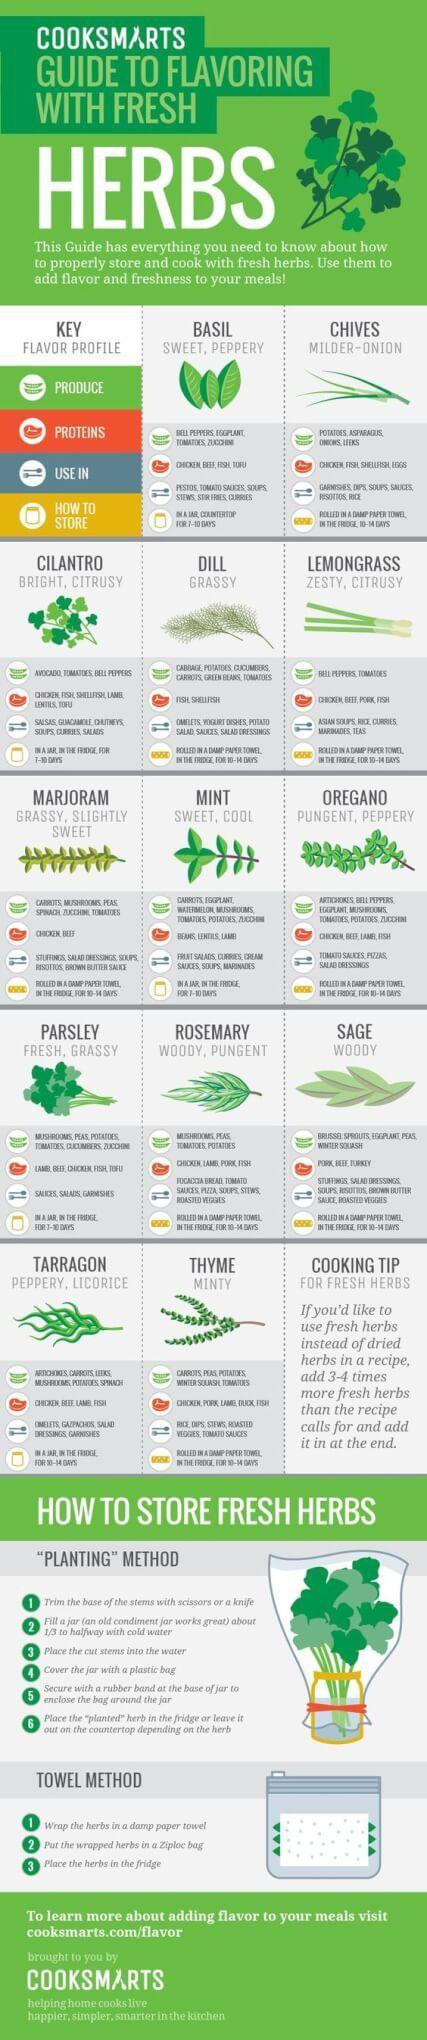 Keep it Fresh with Herbs